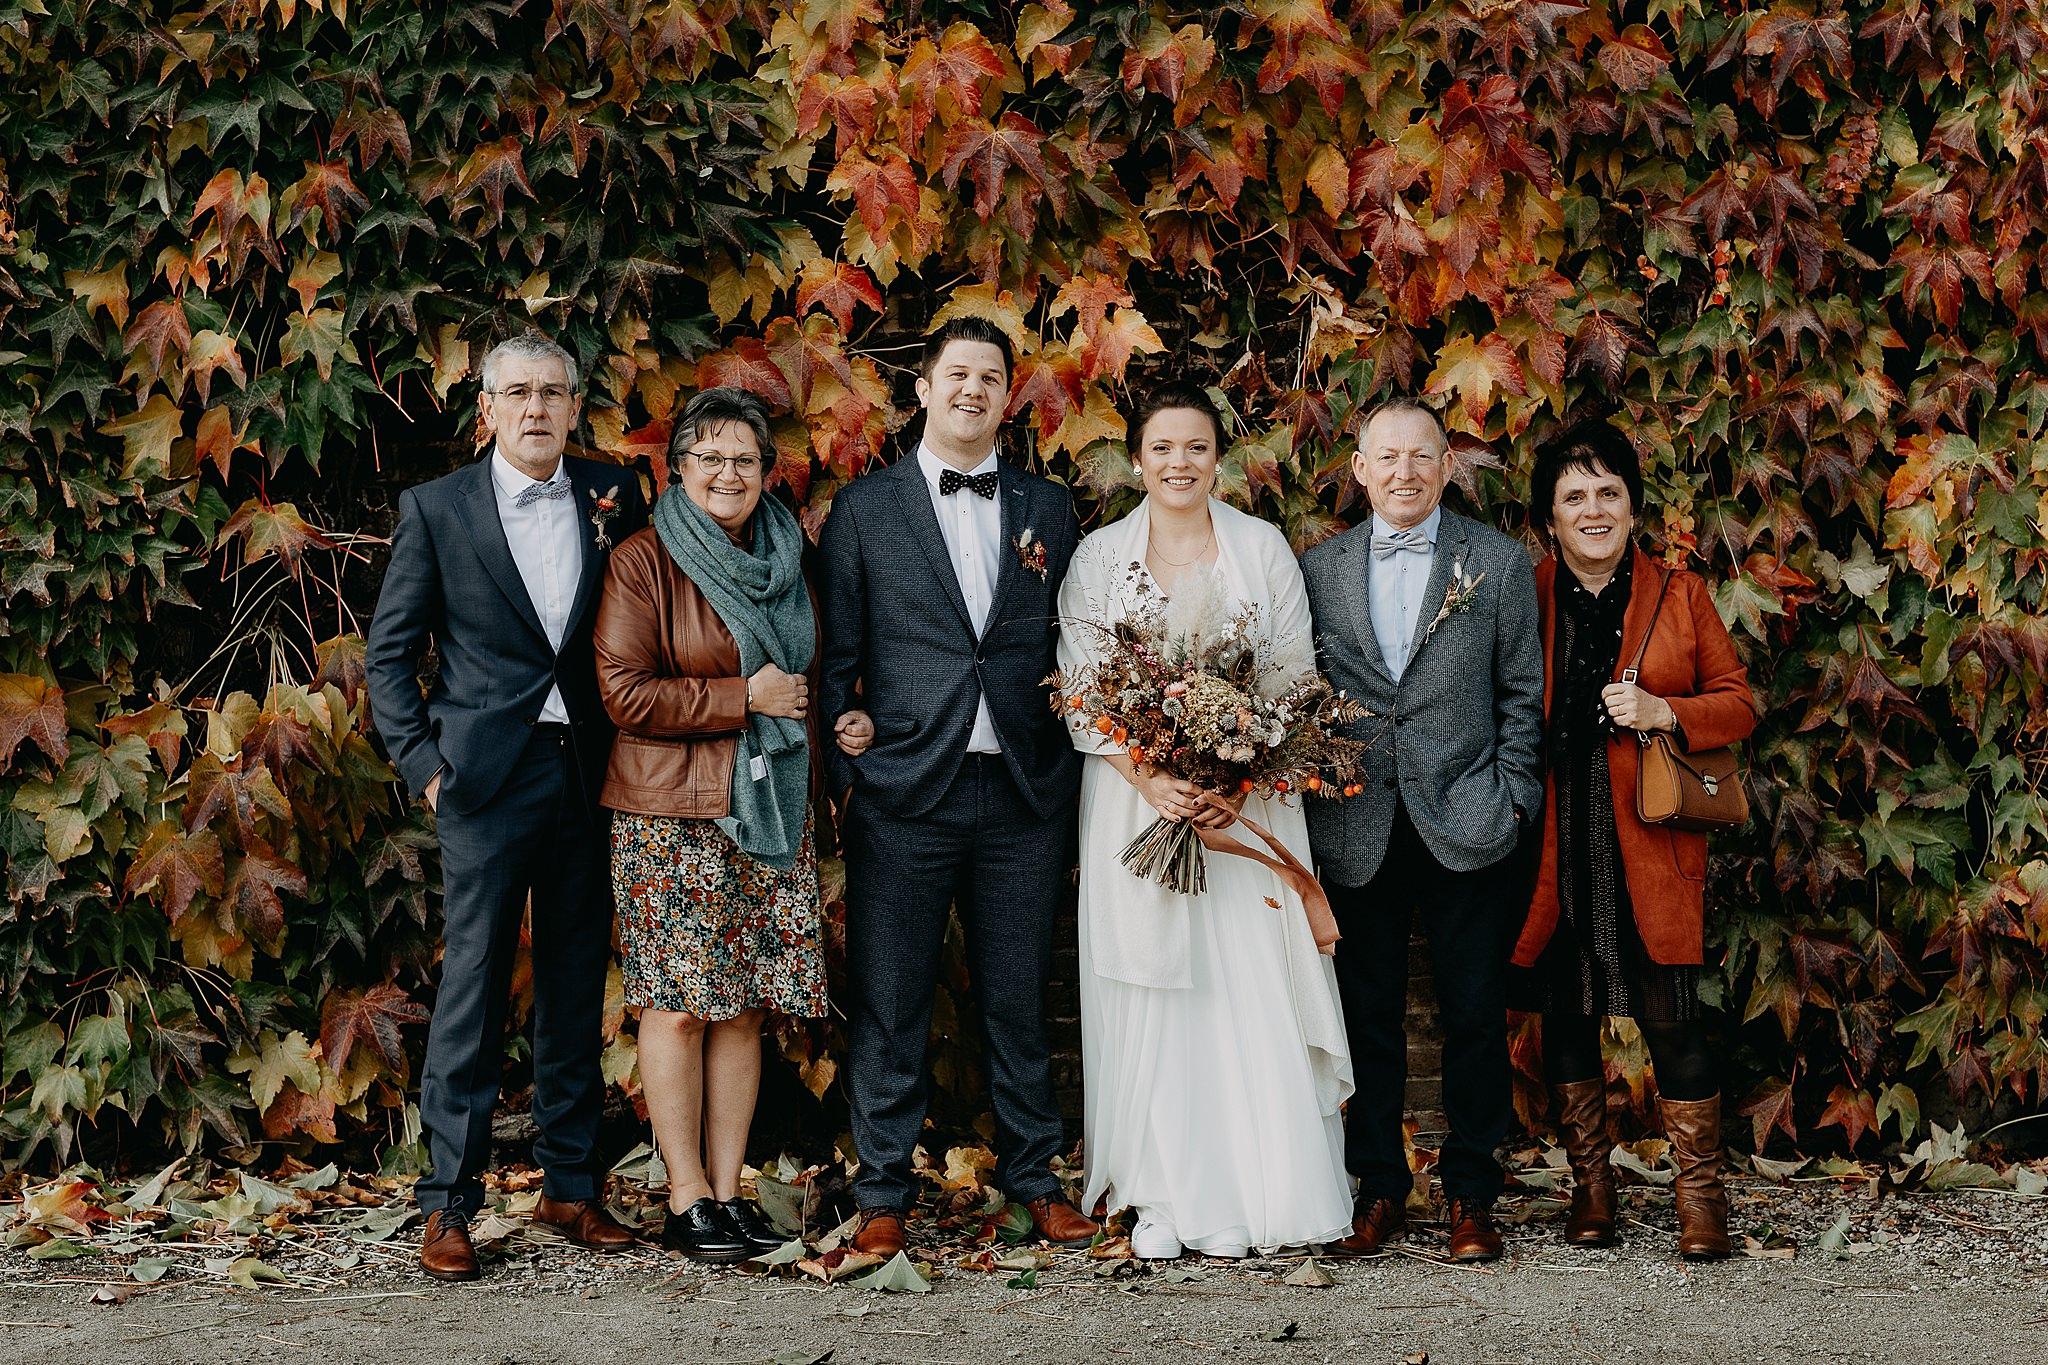 Aulnenhof groepsfoto familie bruidspaar tuin